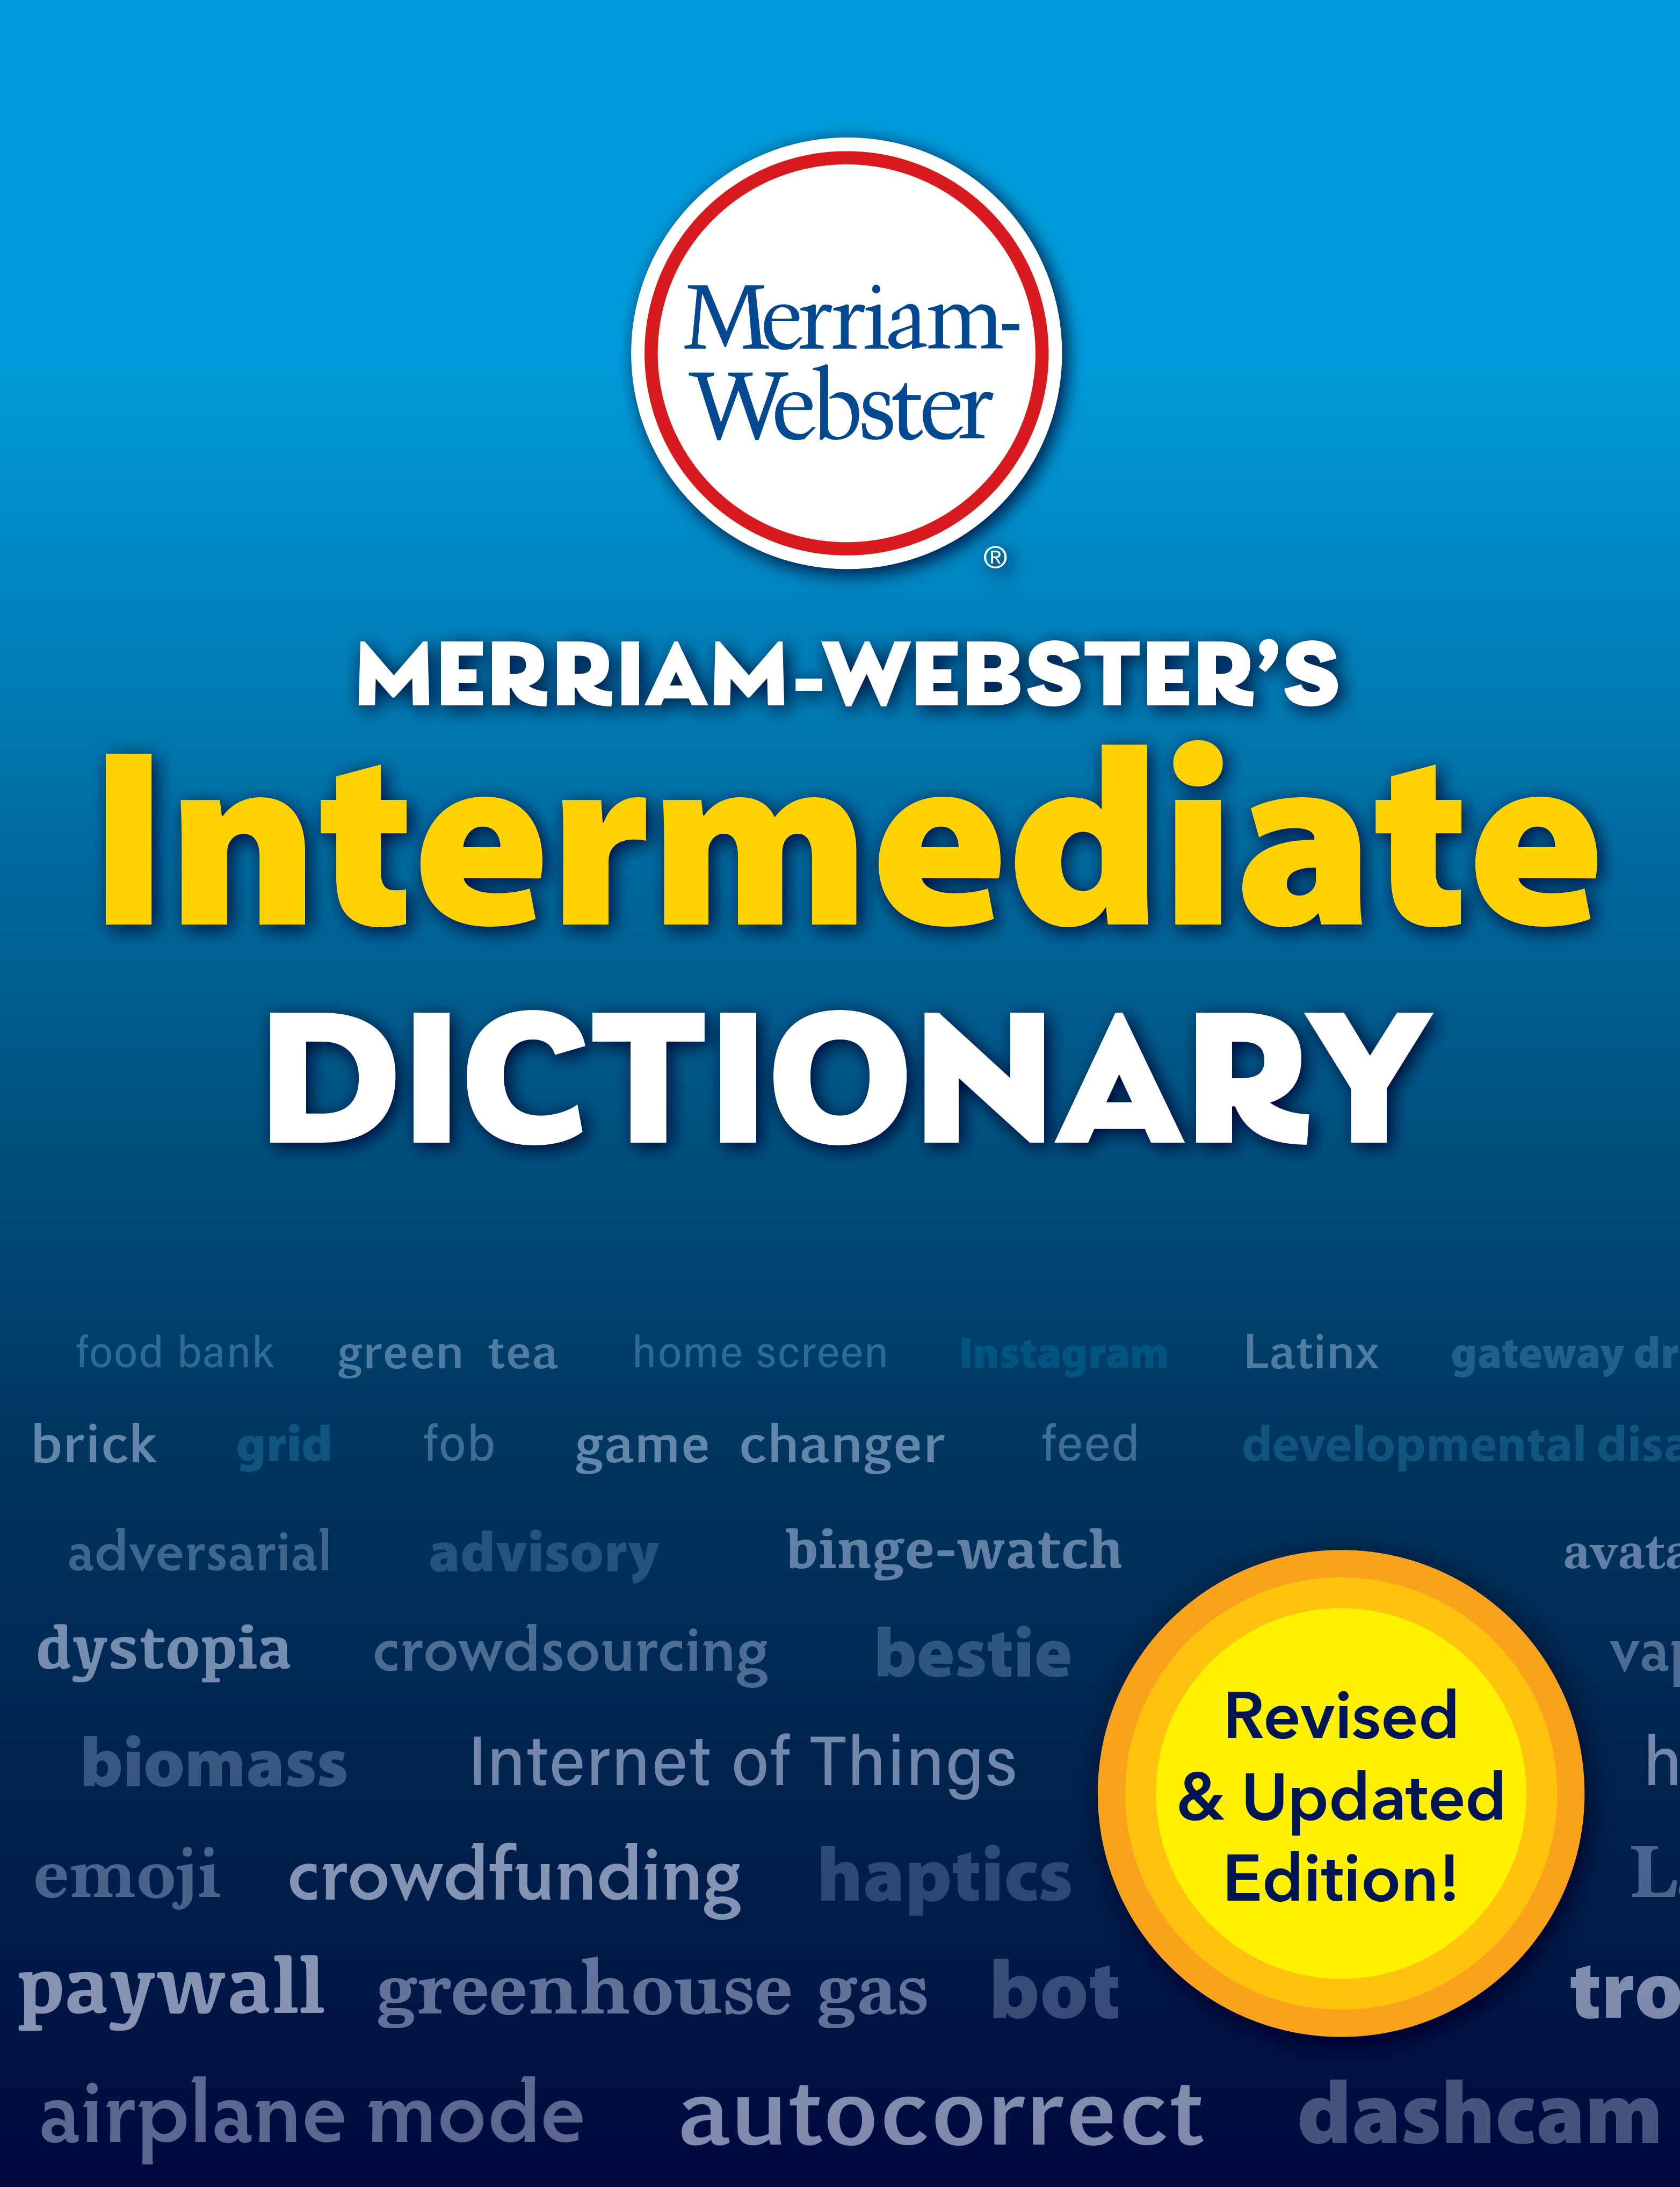 merriam-webster's intermediate dictionary book cover